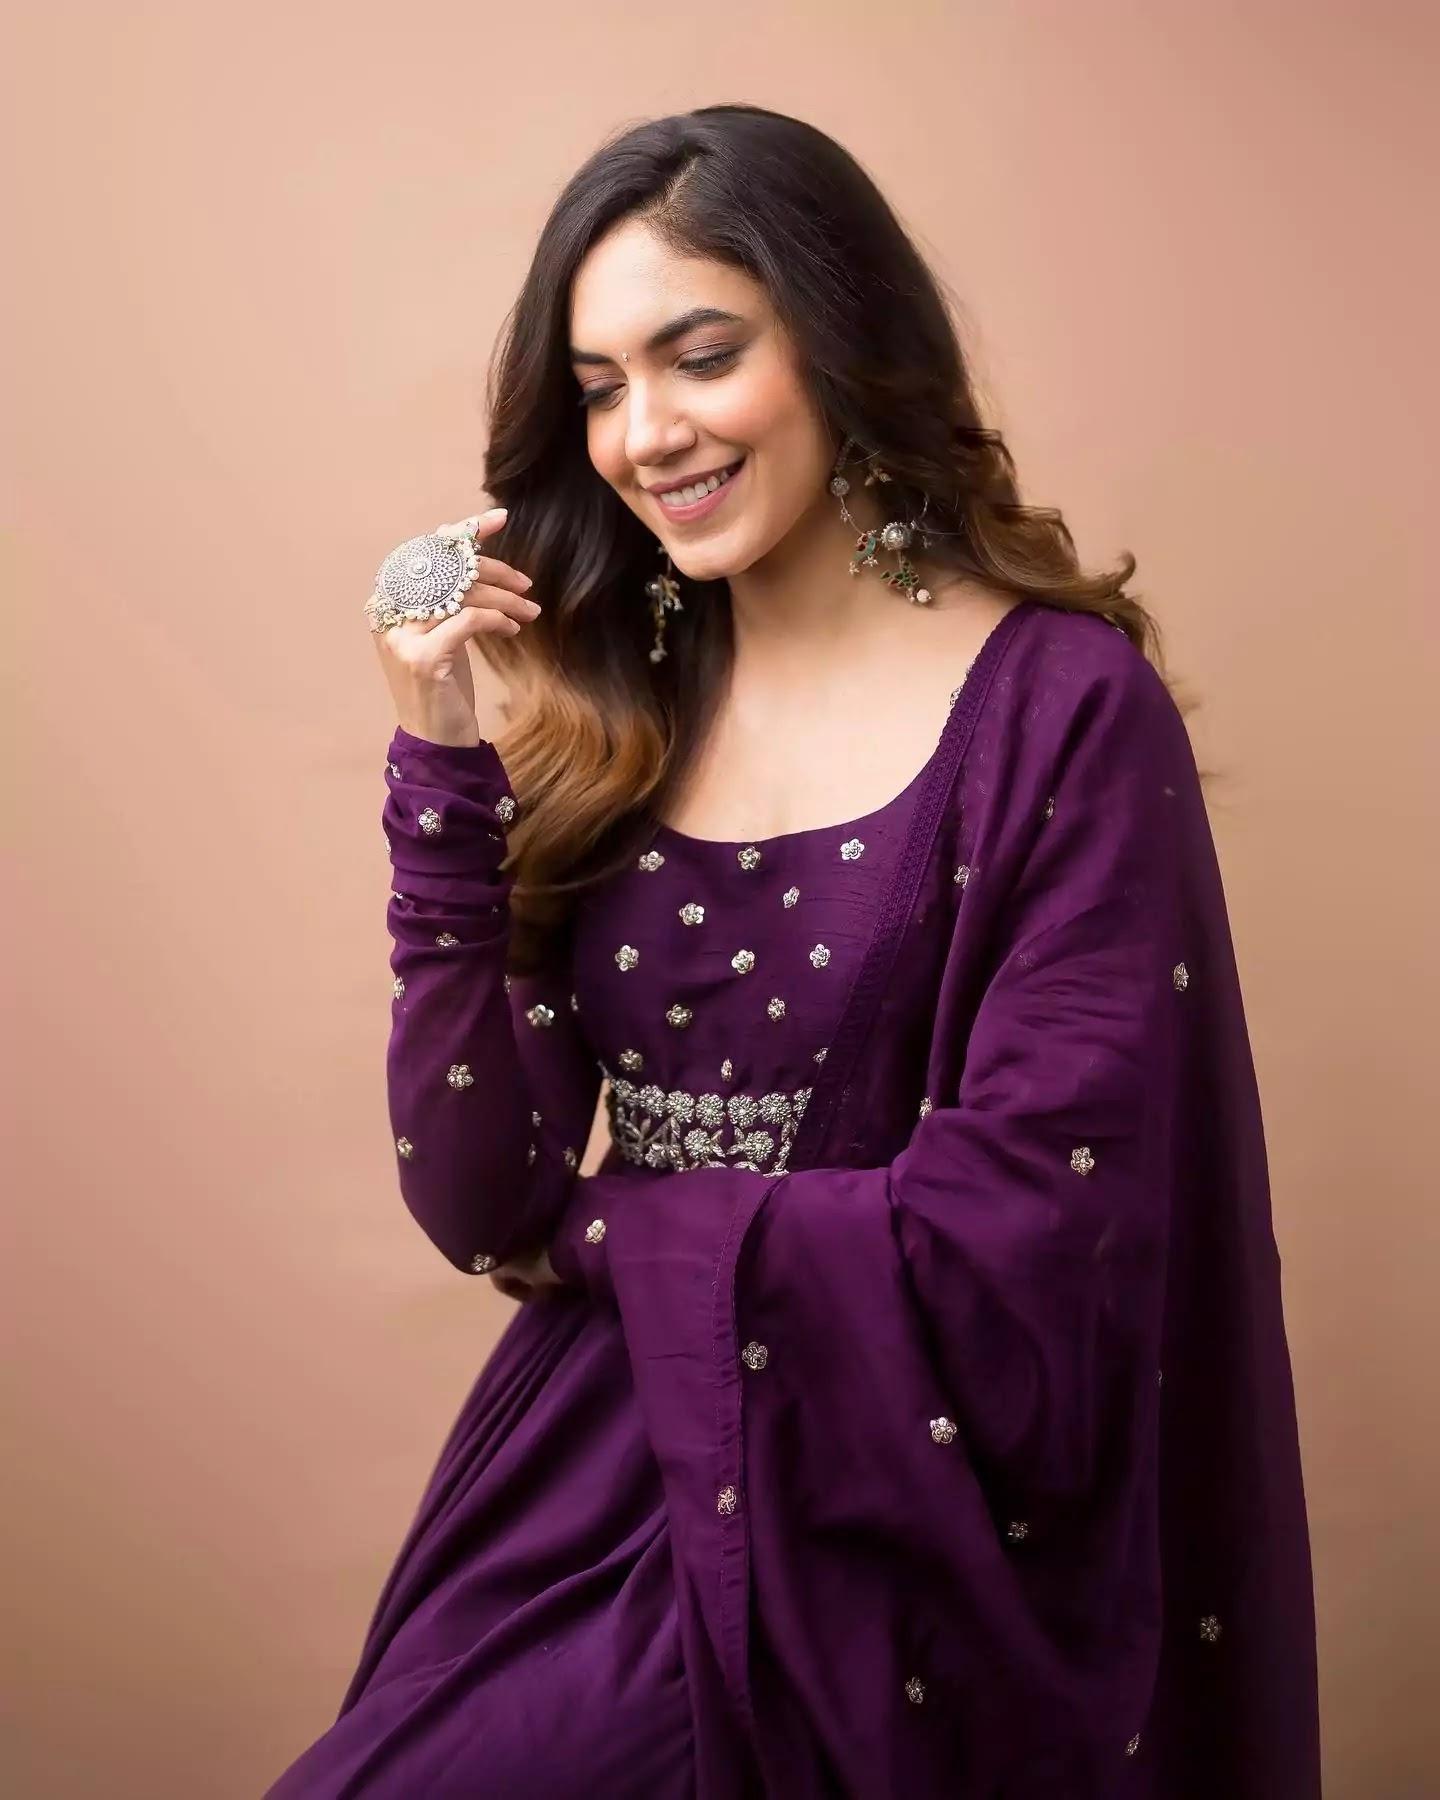 Ritu-Varma-in-purple-anarkali-dress-at-Tuck-jagadish-movie-promotion-event